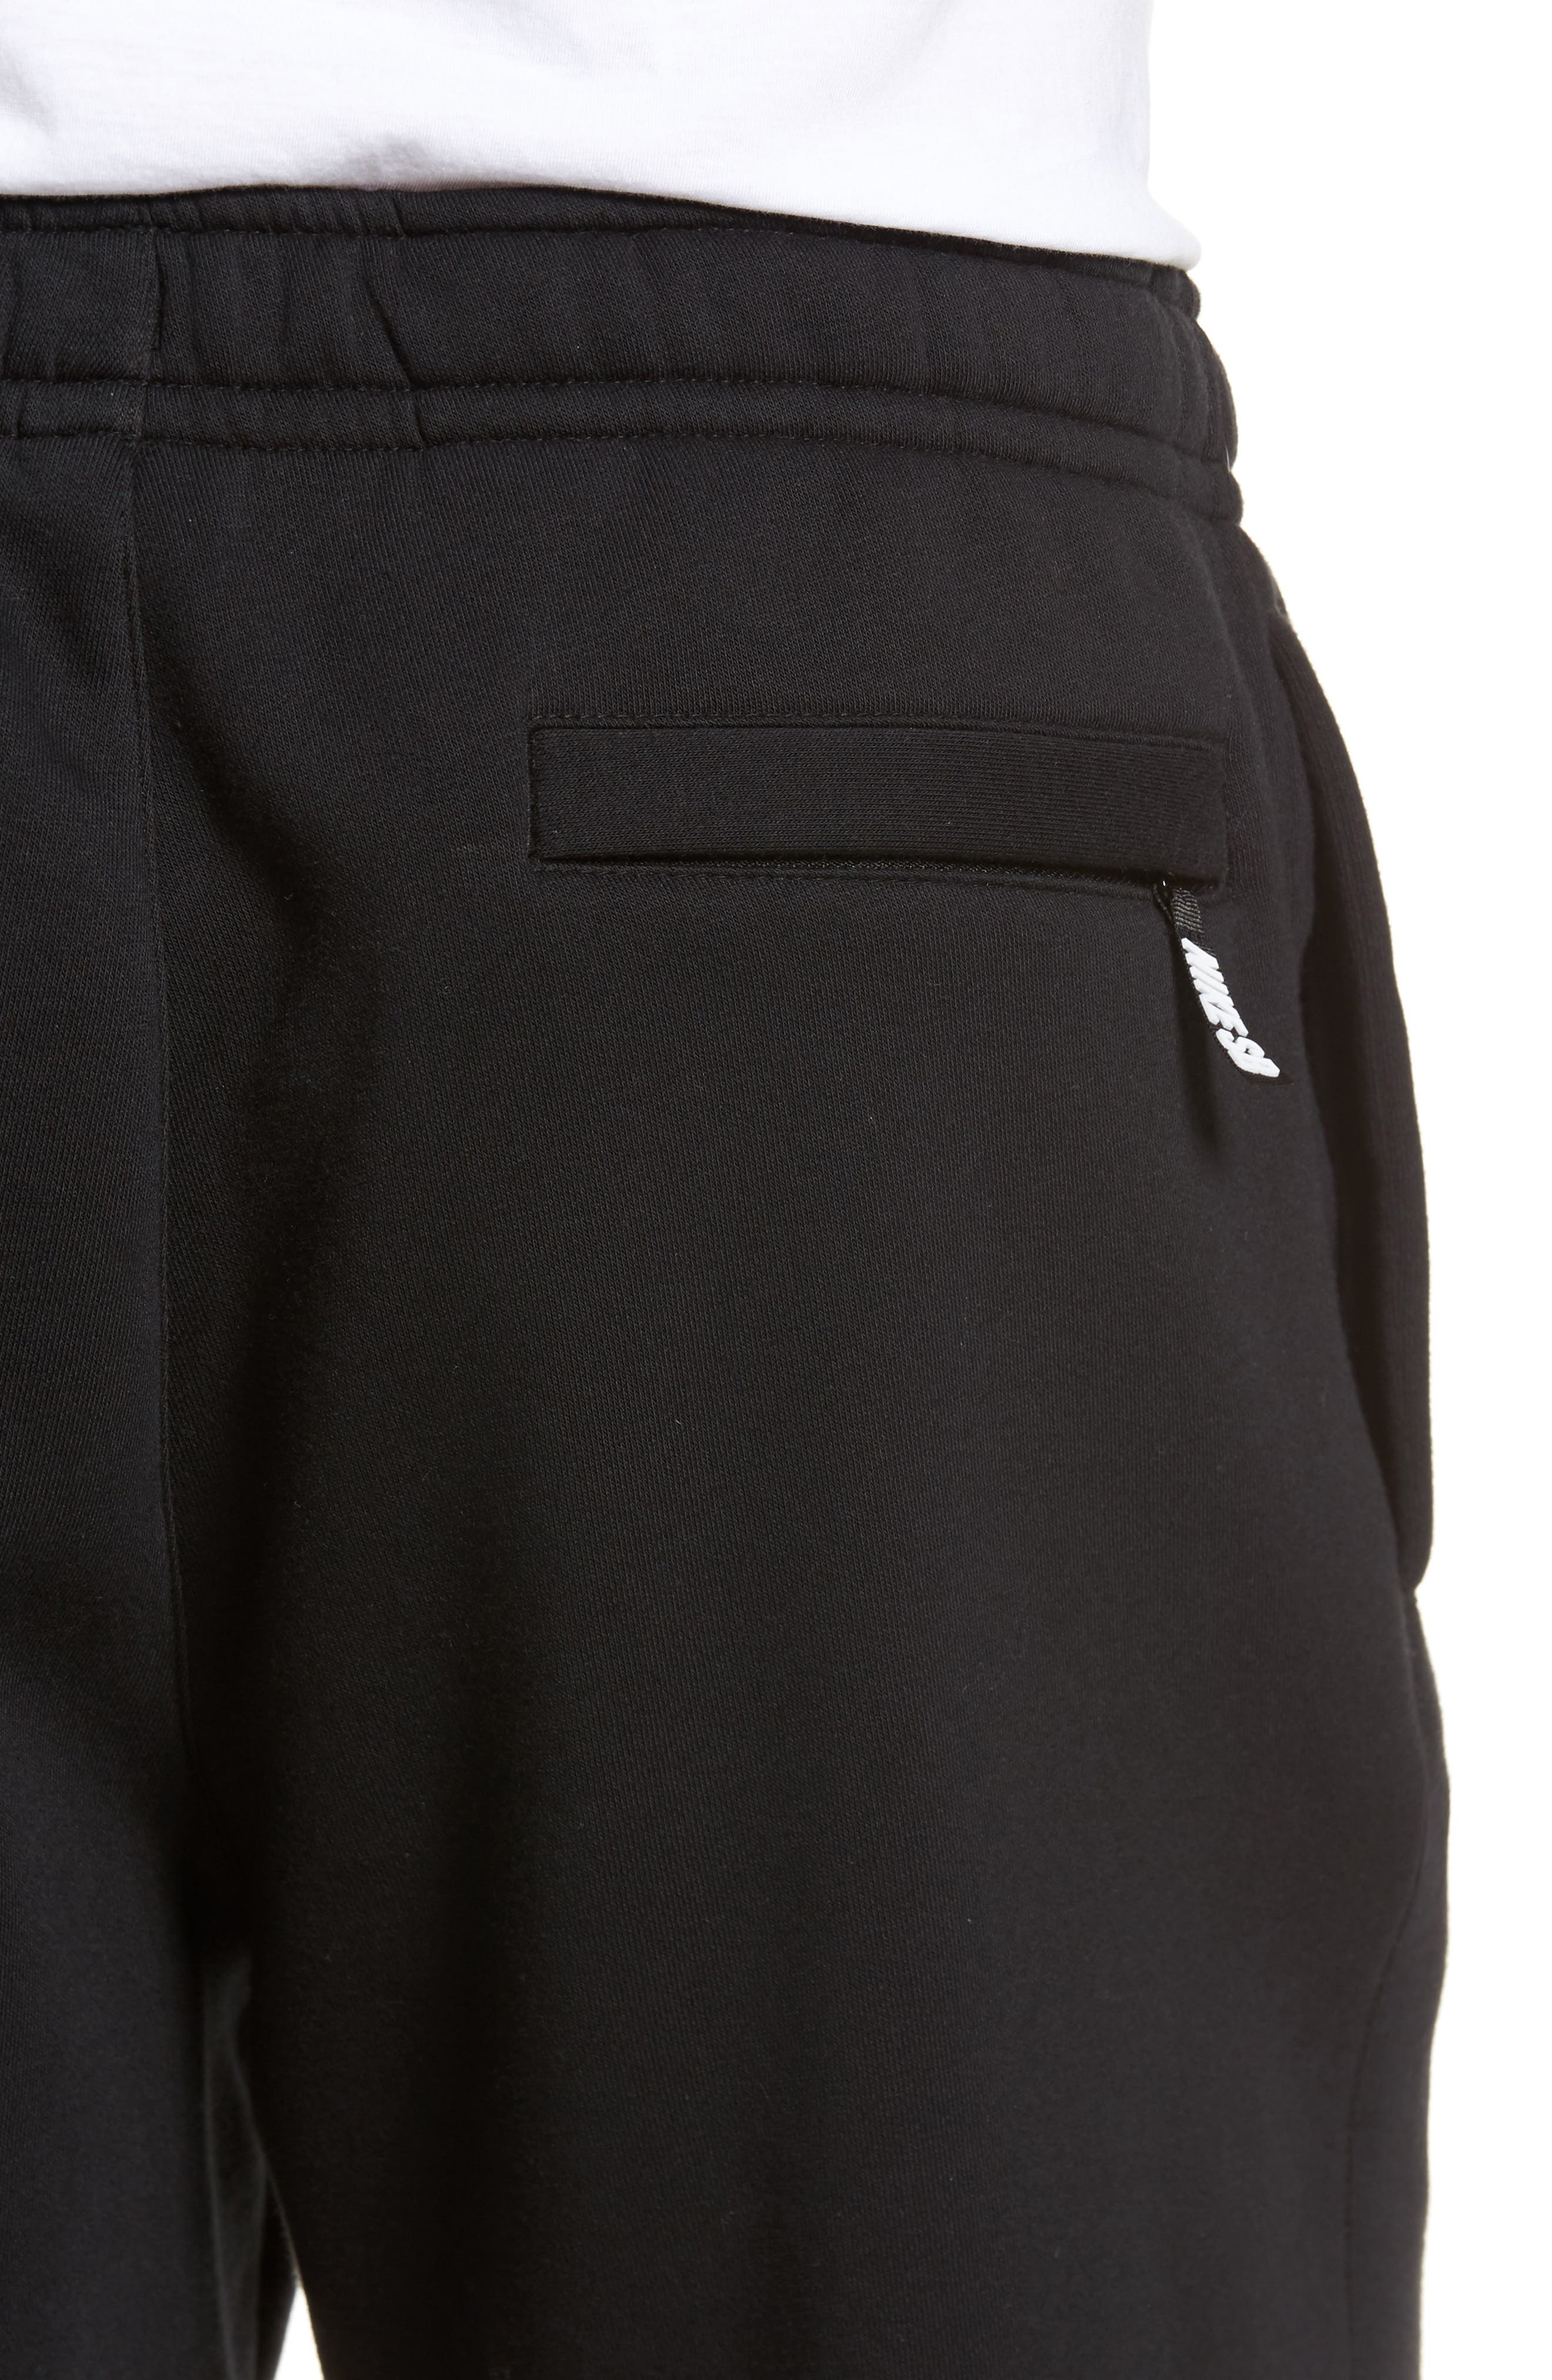 Fleece Shorts,                             Alternate thumbnail 4, color,                             010